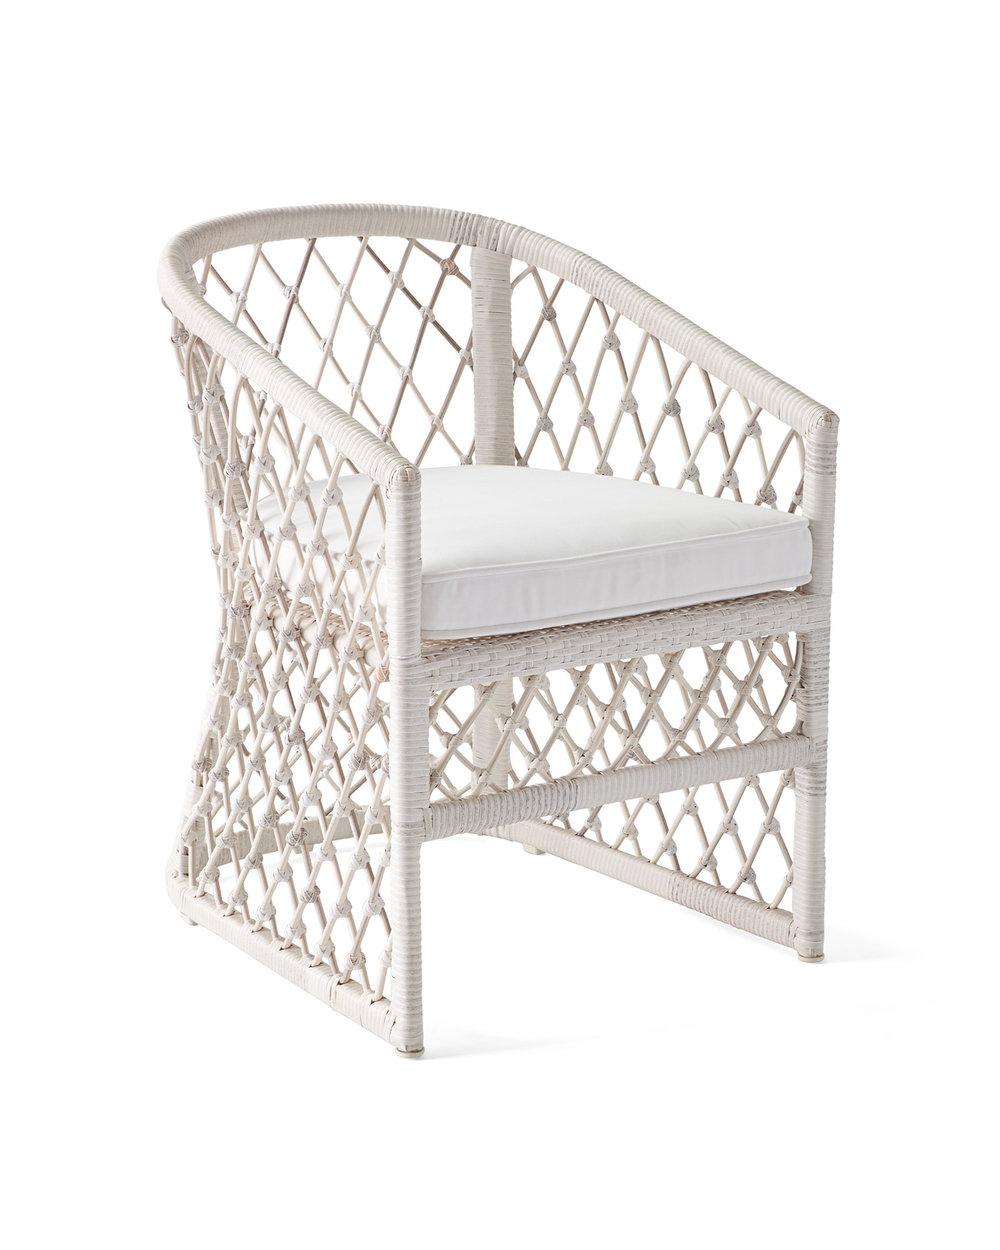 Furn_Capistrano_Dining_Chair_Driftwood_White_Angle_MV_0269_Crop_SH.jpg